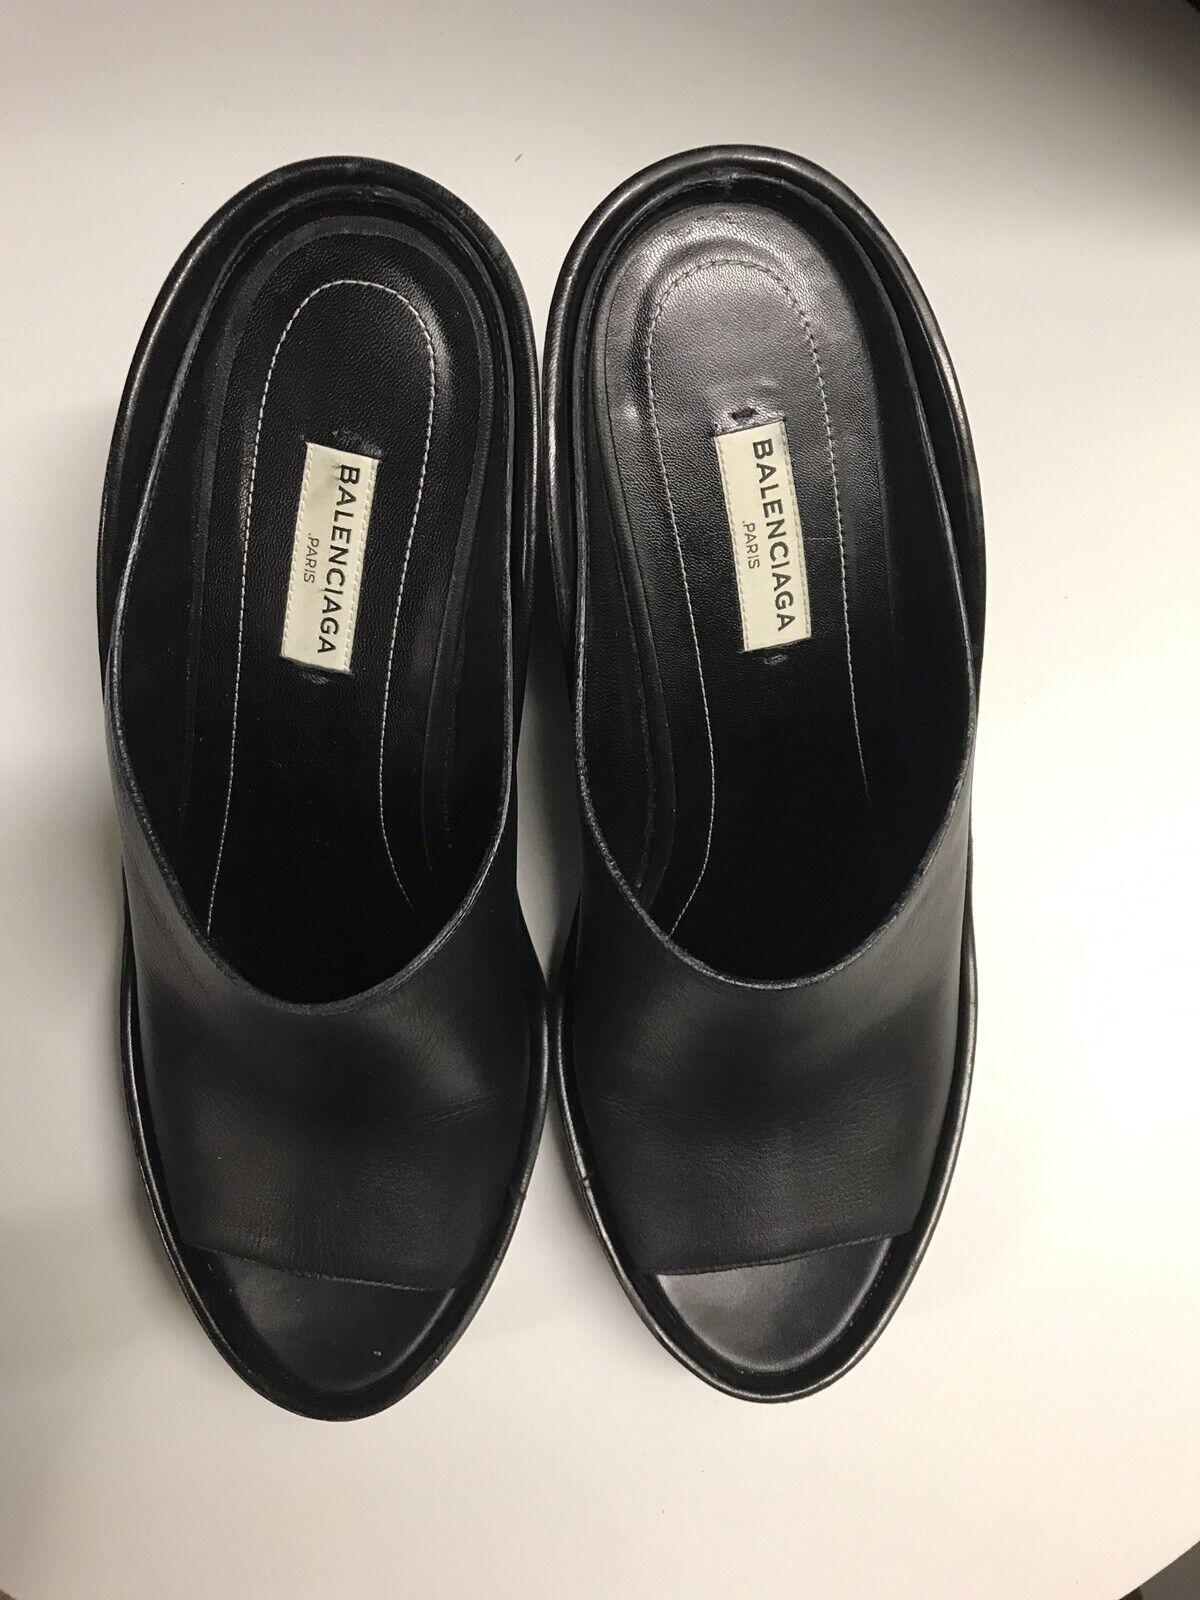 Balenciaga mula Cuero Negro Talla 40 EU 10 US